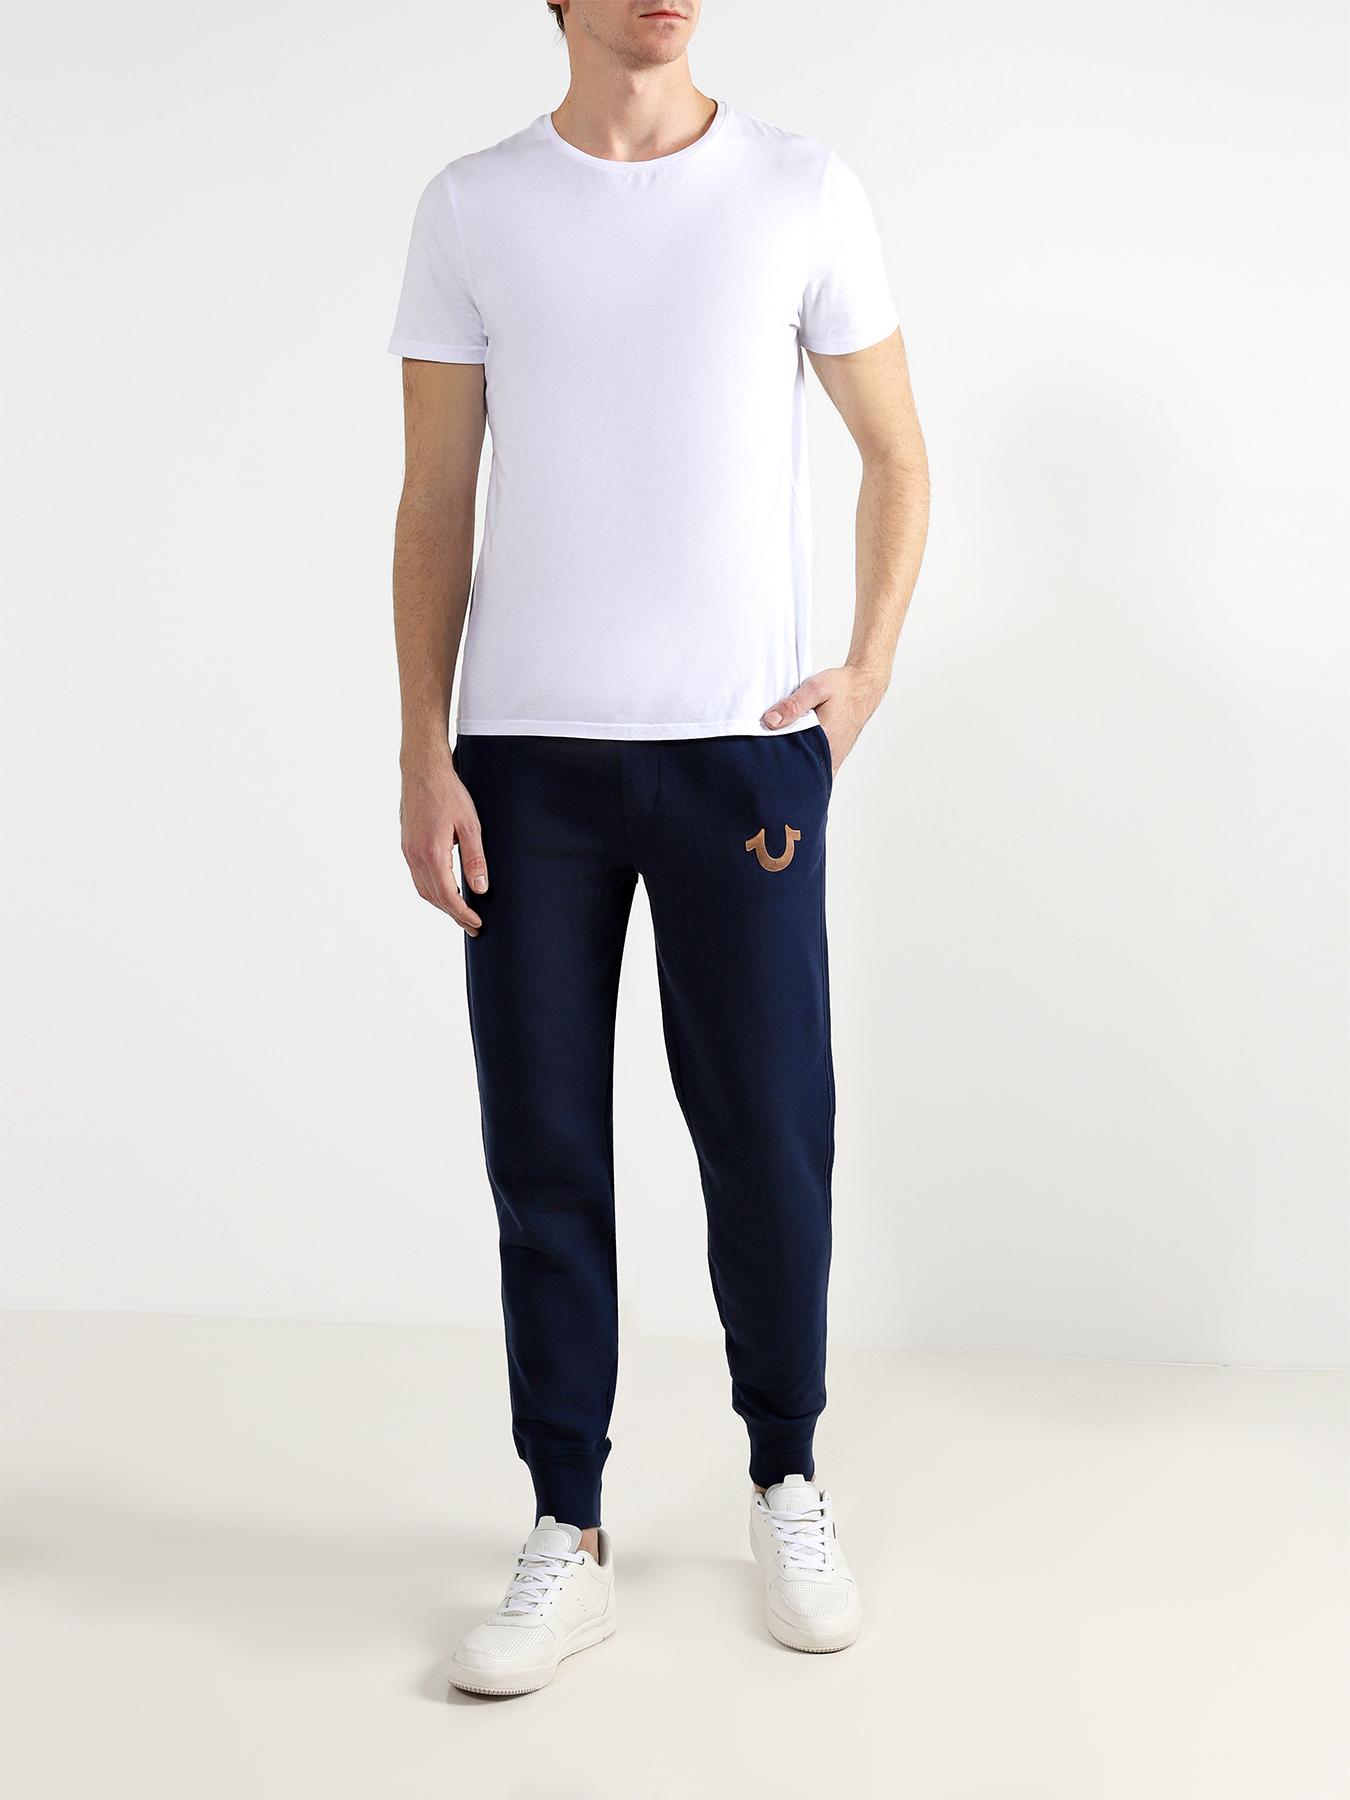 Брюки True Religion Спортивные брюки брюки спортивные columbia columbia anytime outdoor boot cut pant